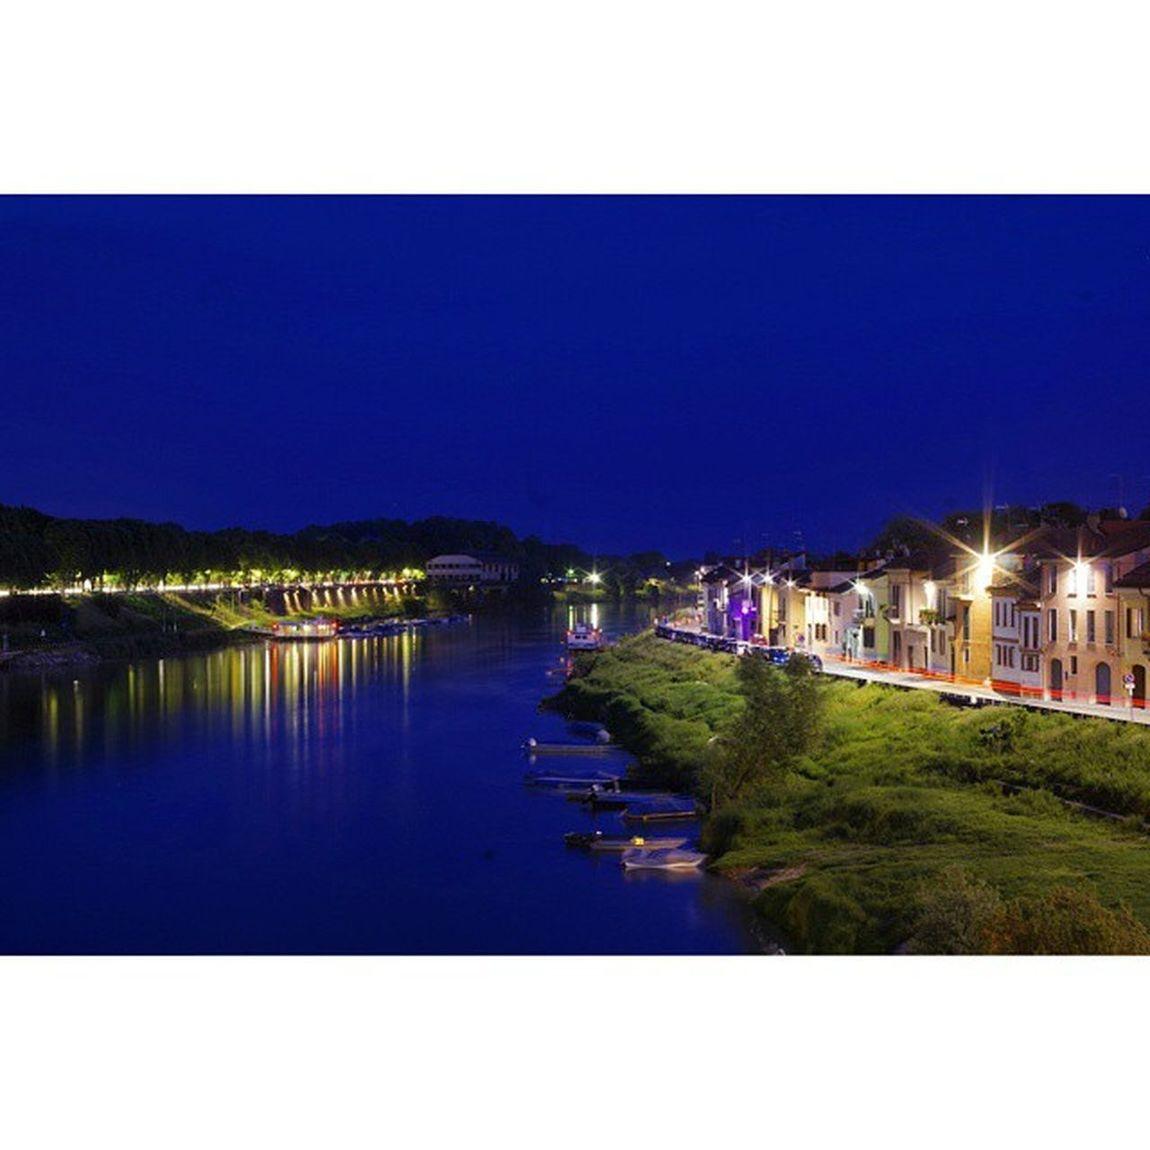 Pentax K50 50mm Photo Photographer Photograph Pavia Borgo Ticino Pianura Padana Blue Hour Light Reflex Night Water Pontecopertopavia Bridge Italy Italia